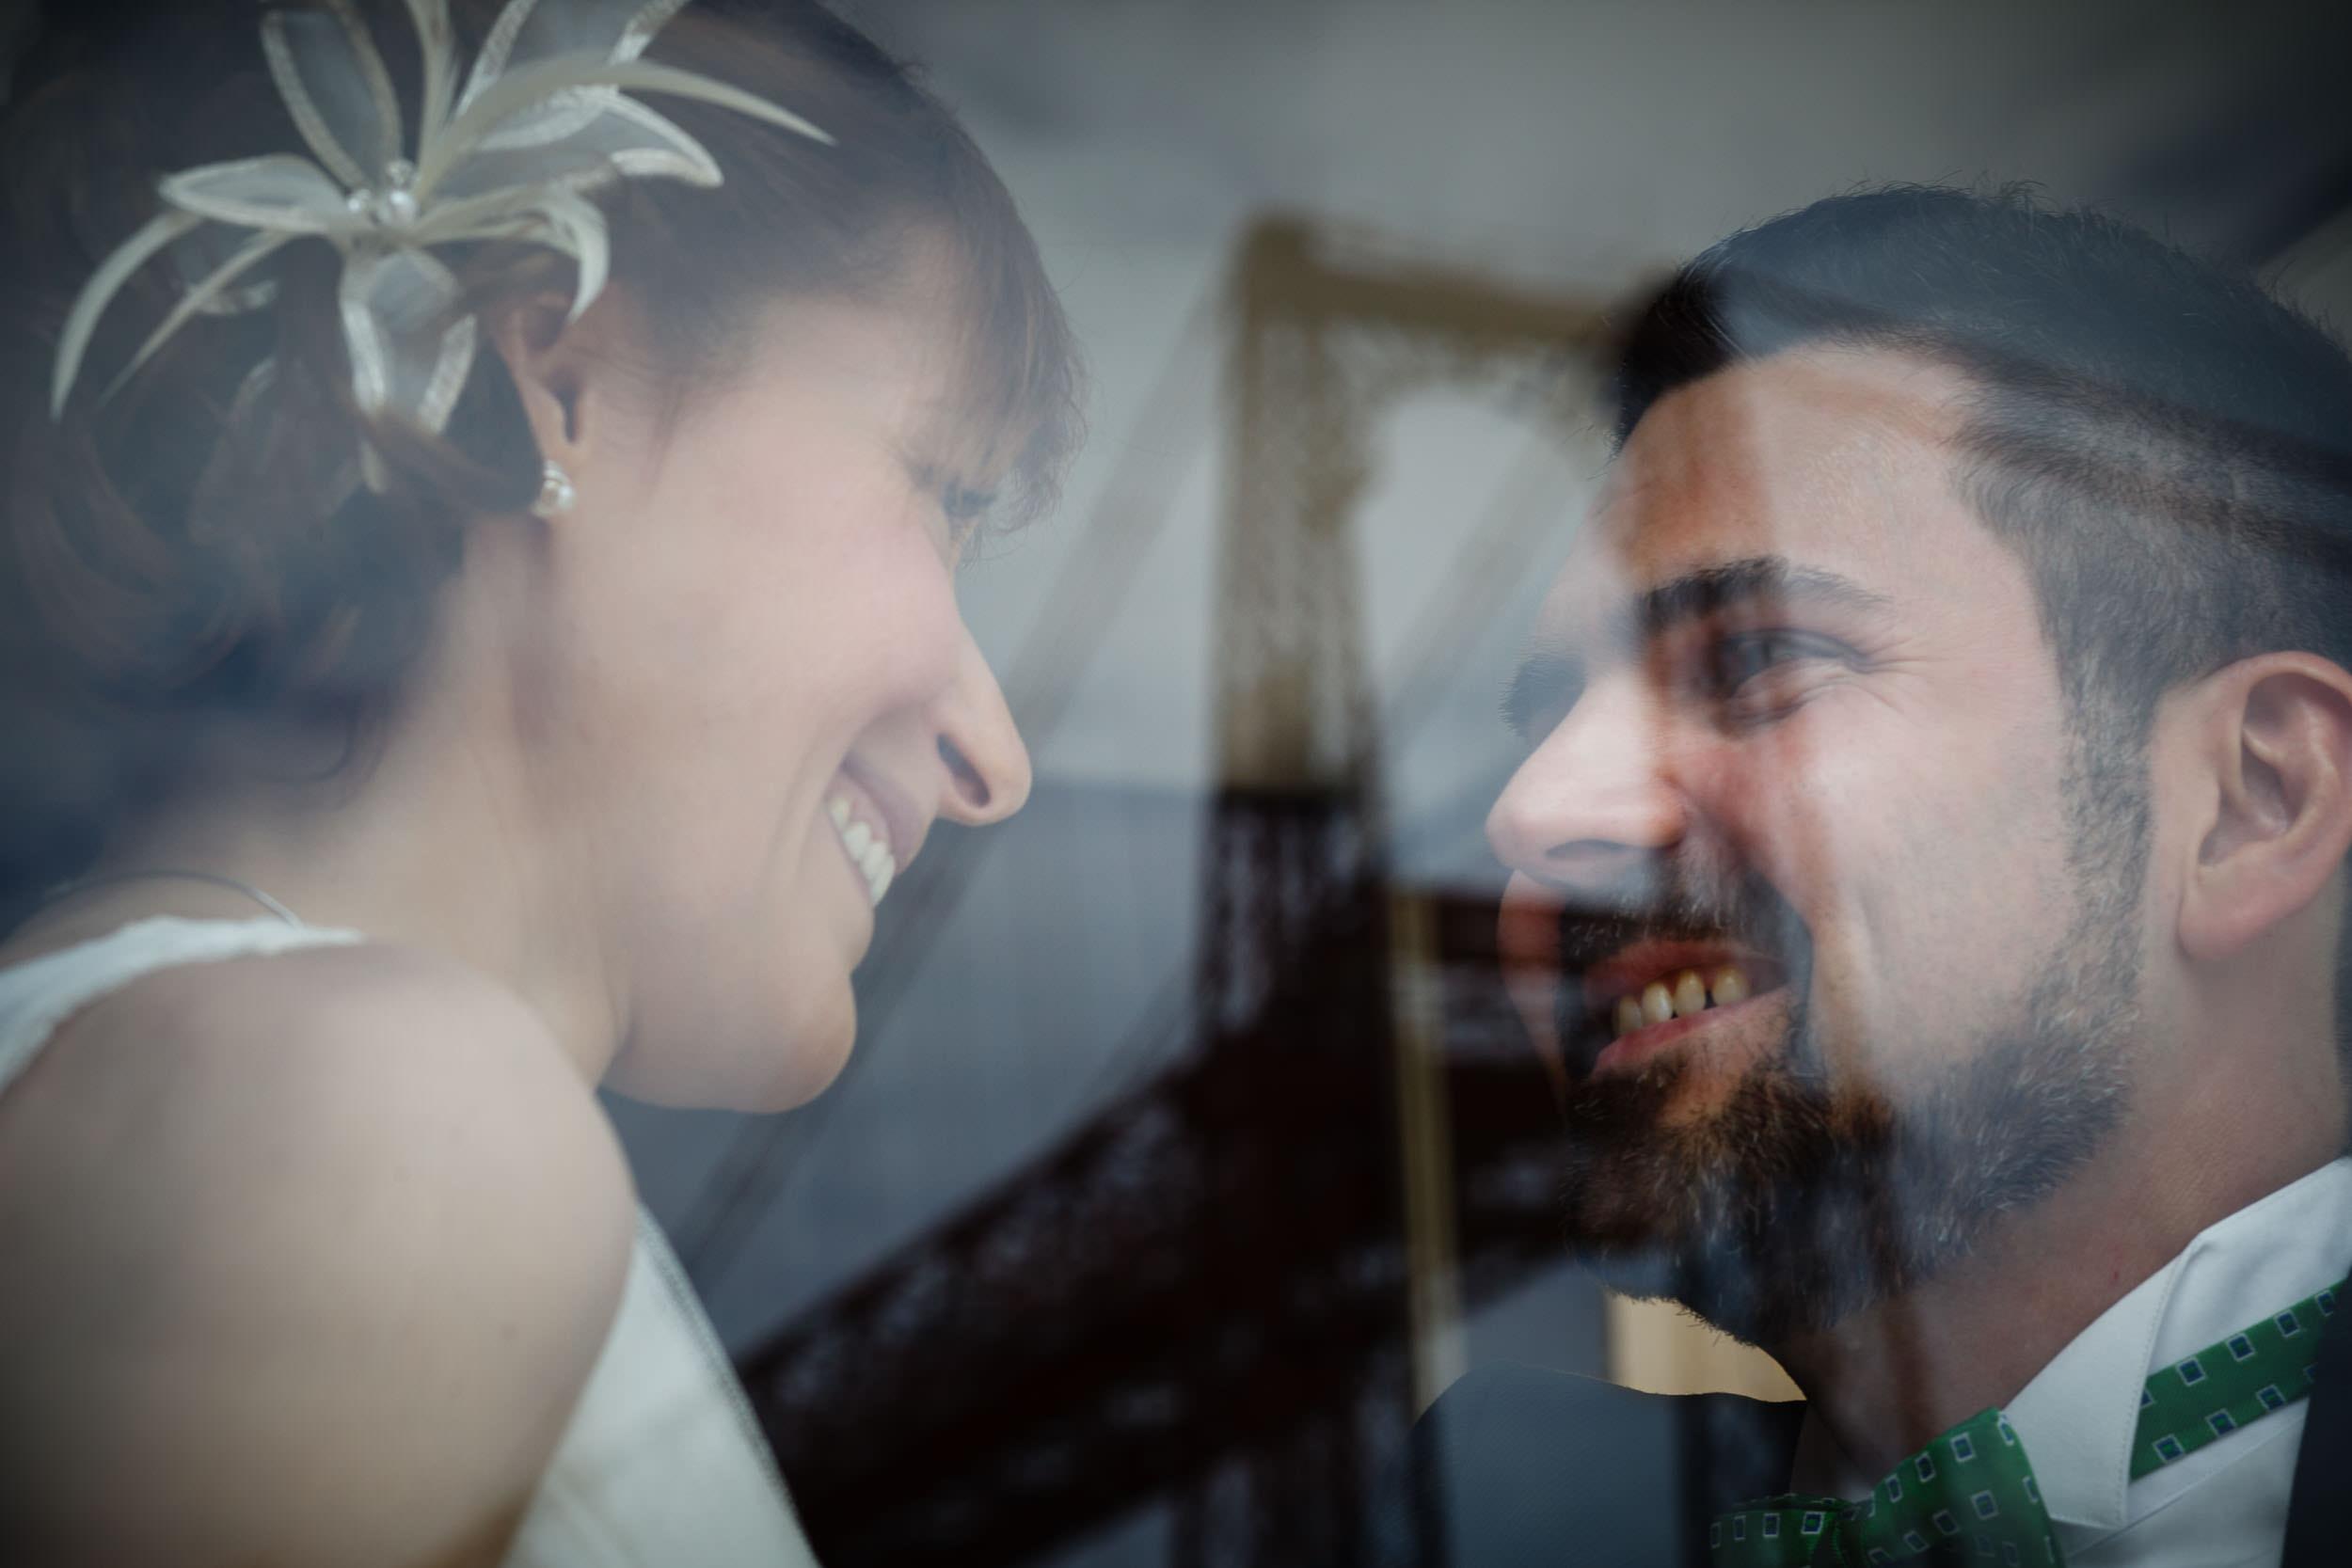 Engagement photography in Portugalete, Basque Country, Spain - James Sturcke  Photographer | sturcke.org_002.jpg